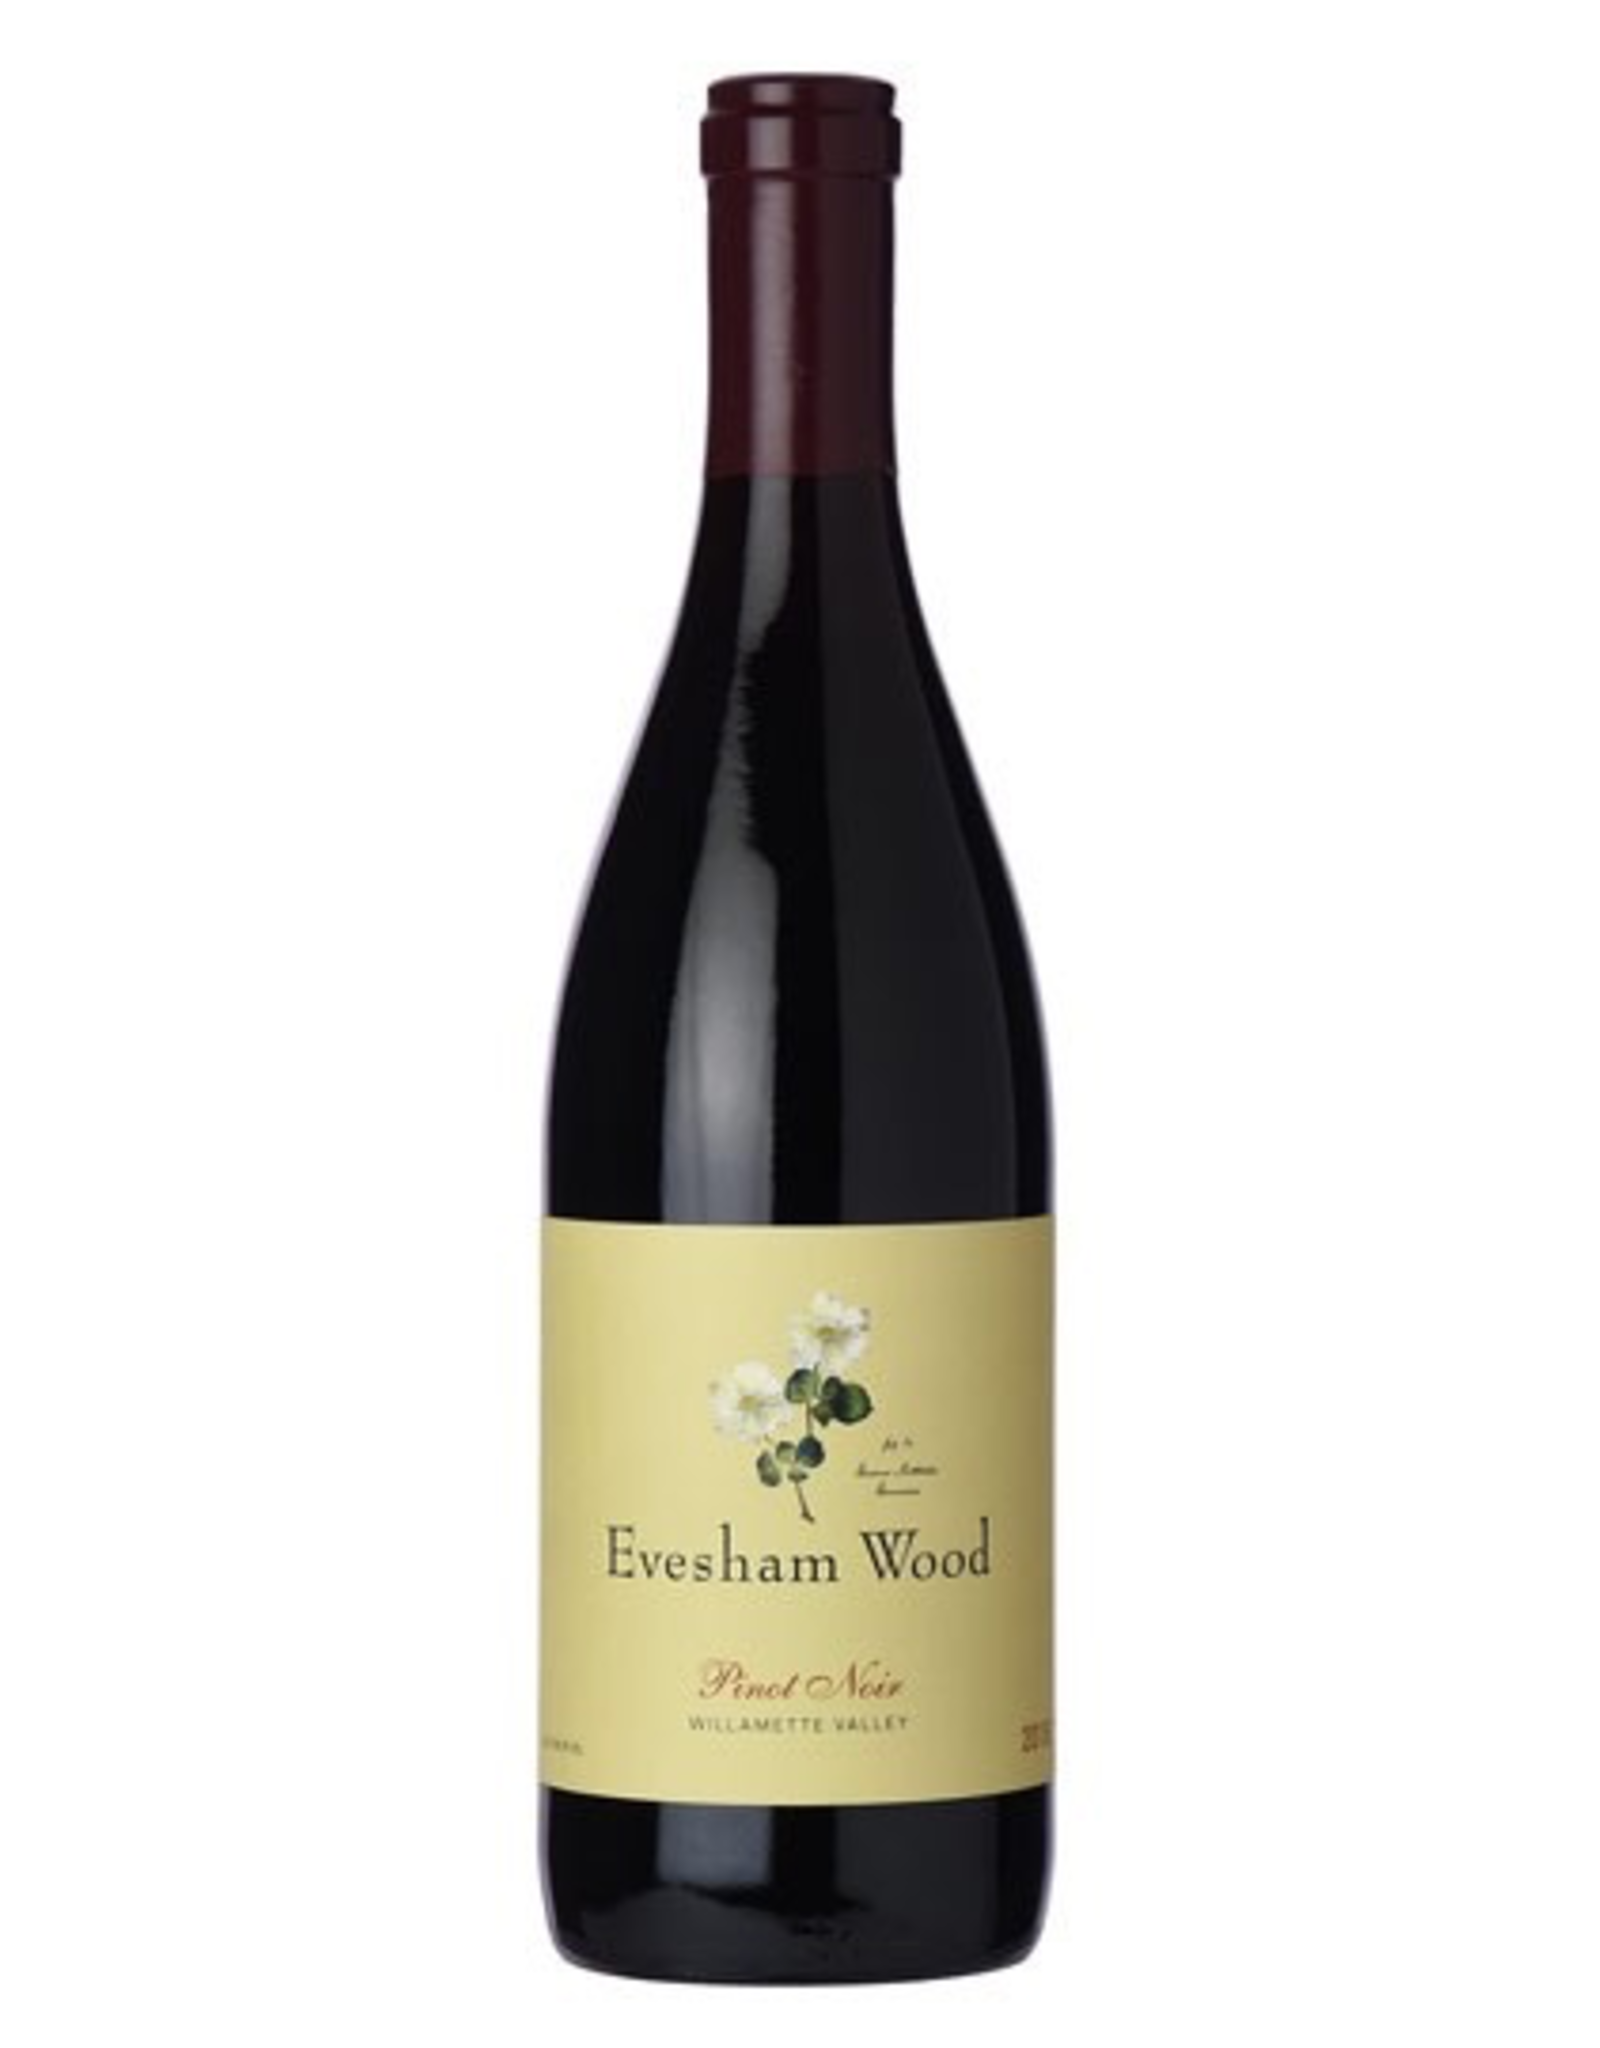 Red Wine 2019, Evesham Wood, Pinot Noir, Multi-regional Blend, Willamette Valley, Oregon, 13.0% Alc, CTnr, JS92